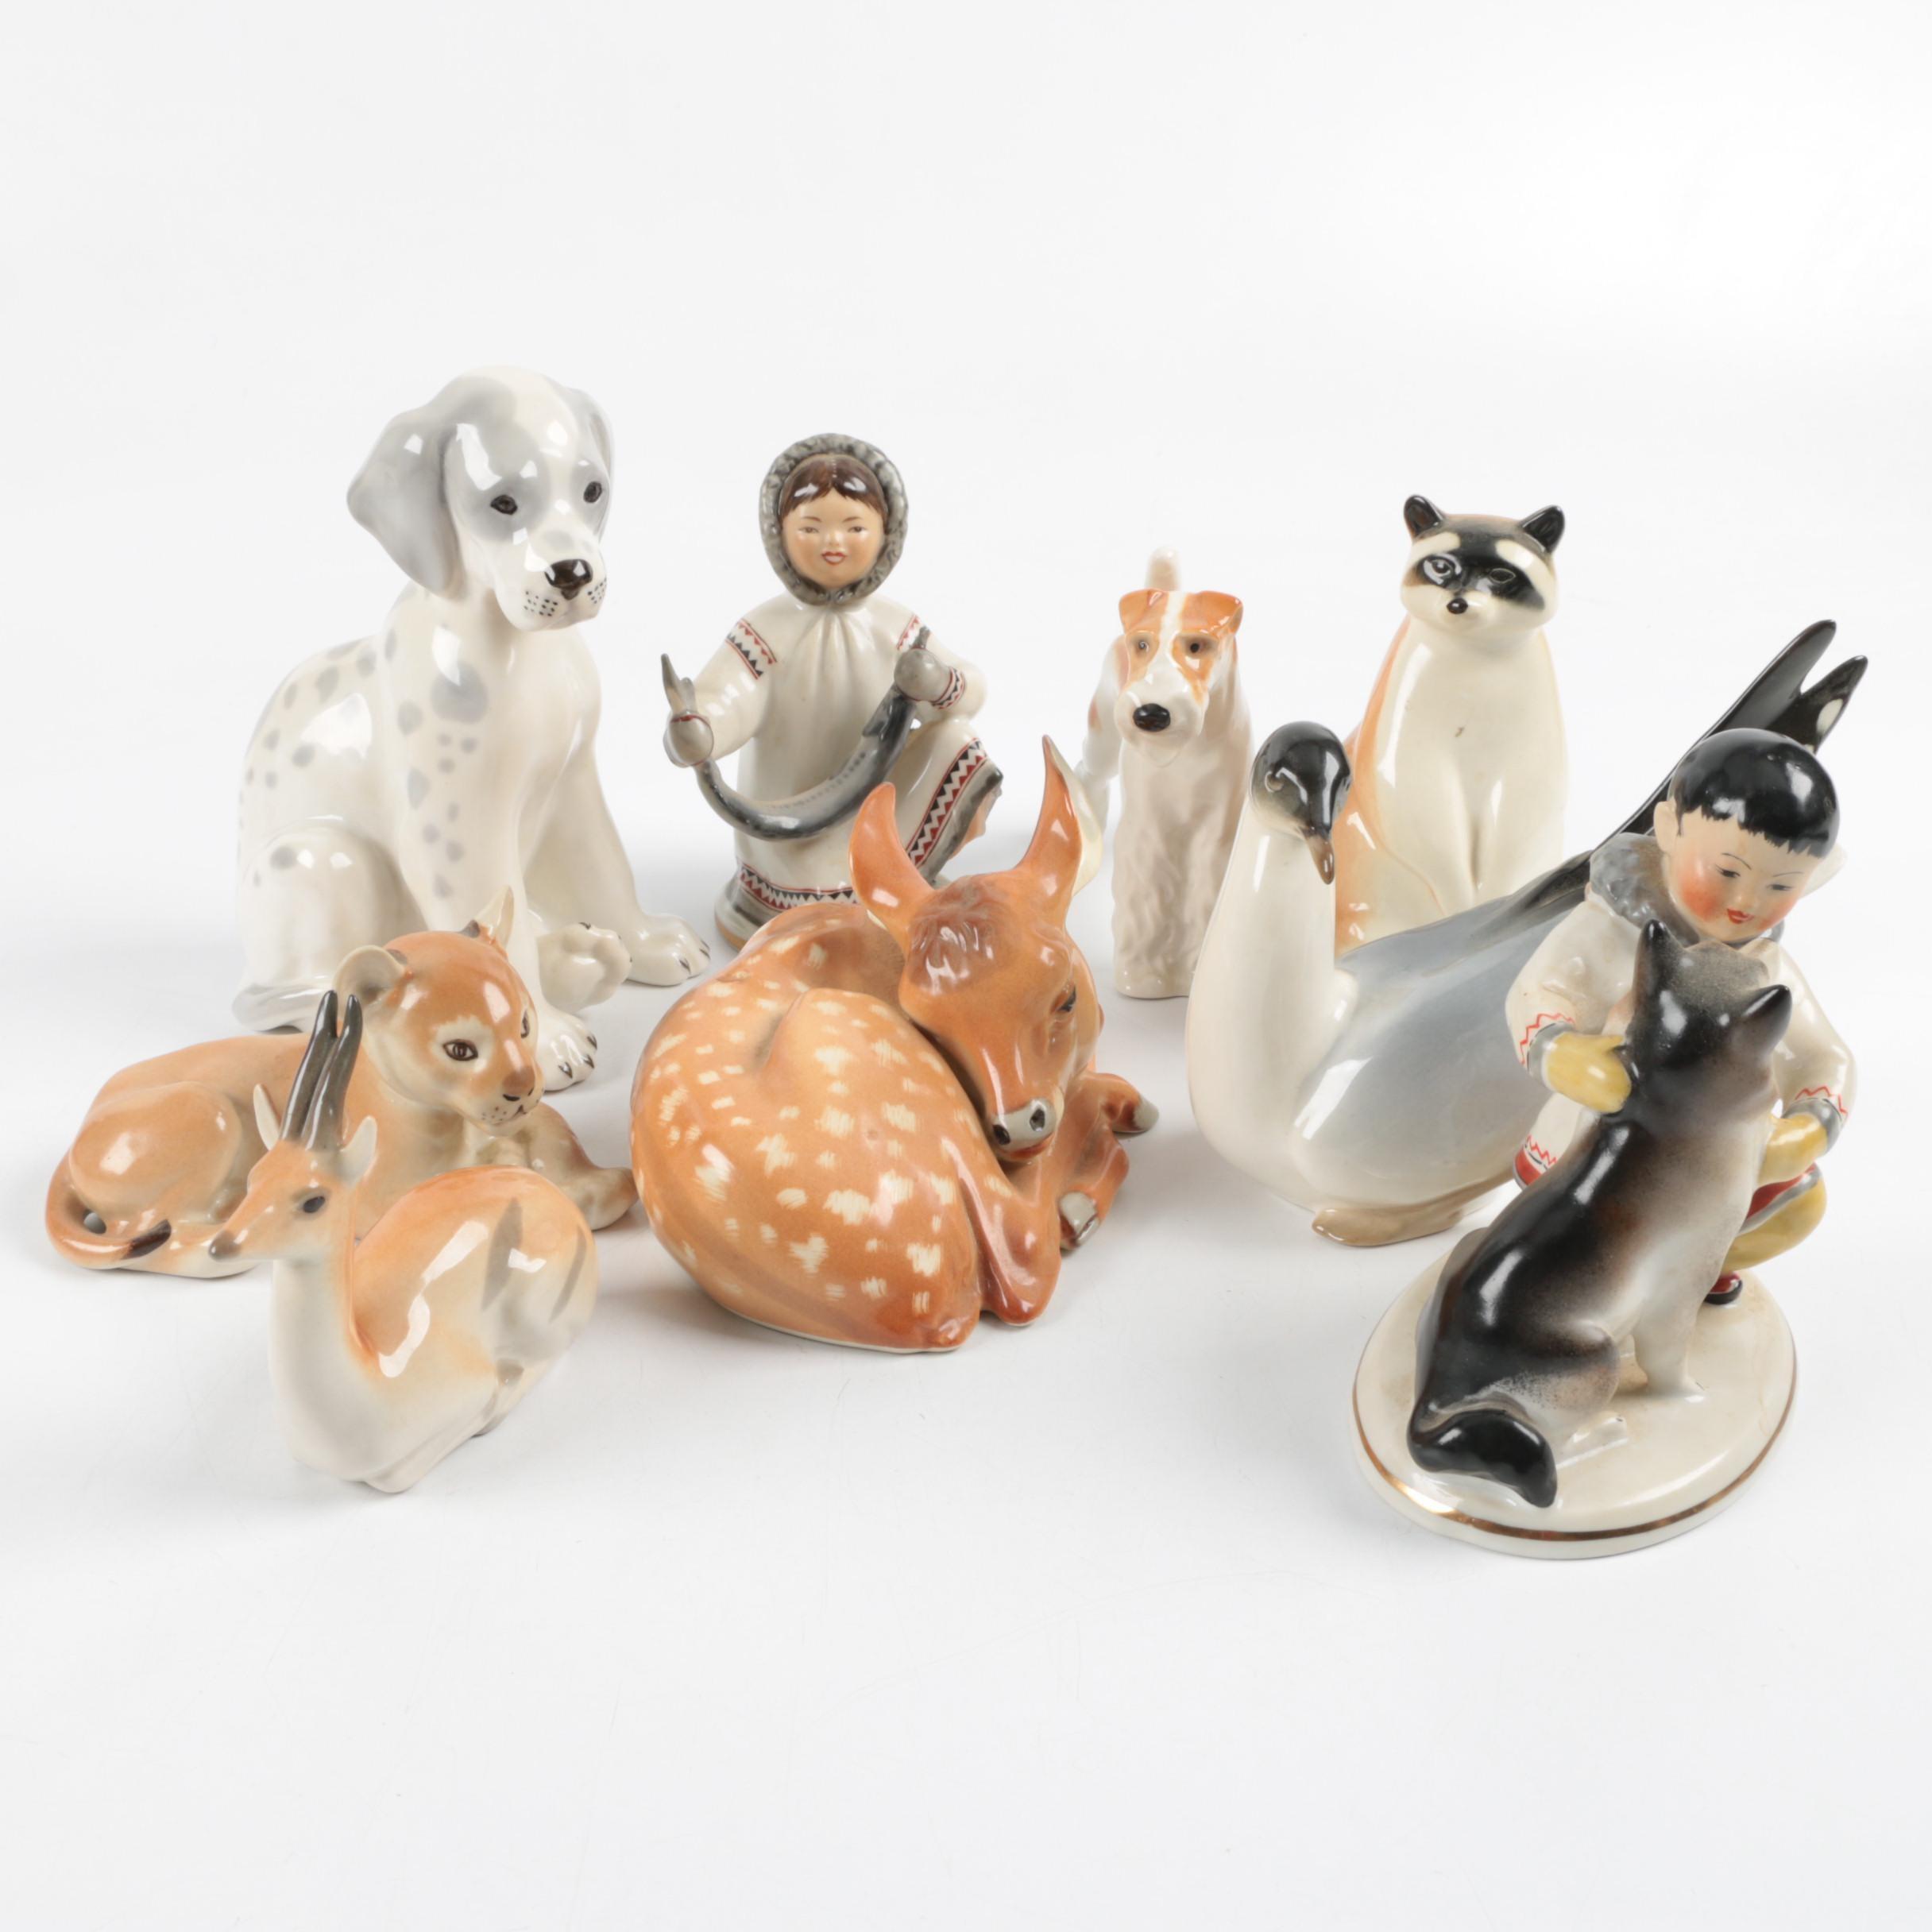 Collection of Russian Lomonosov Porcelain Figurines